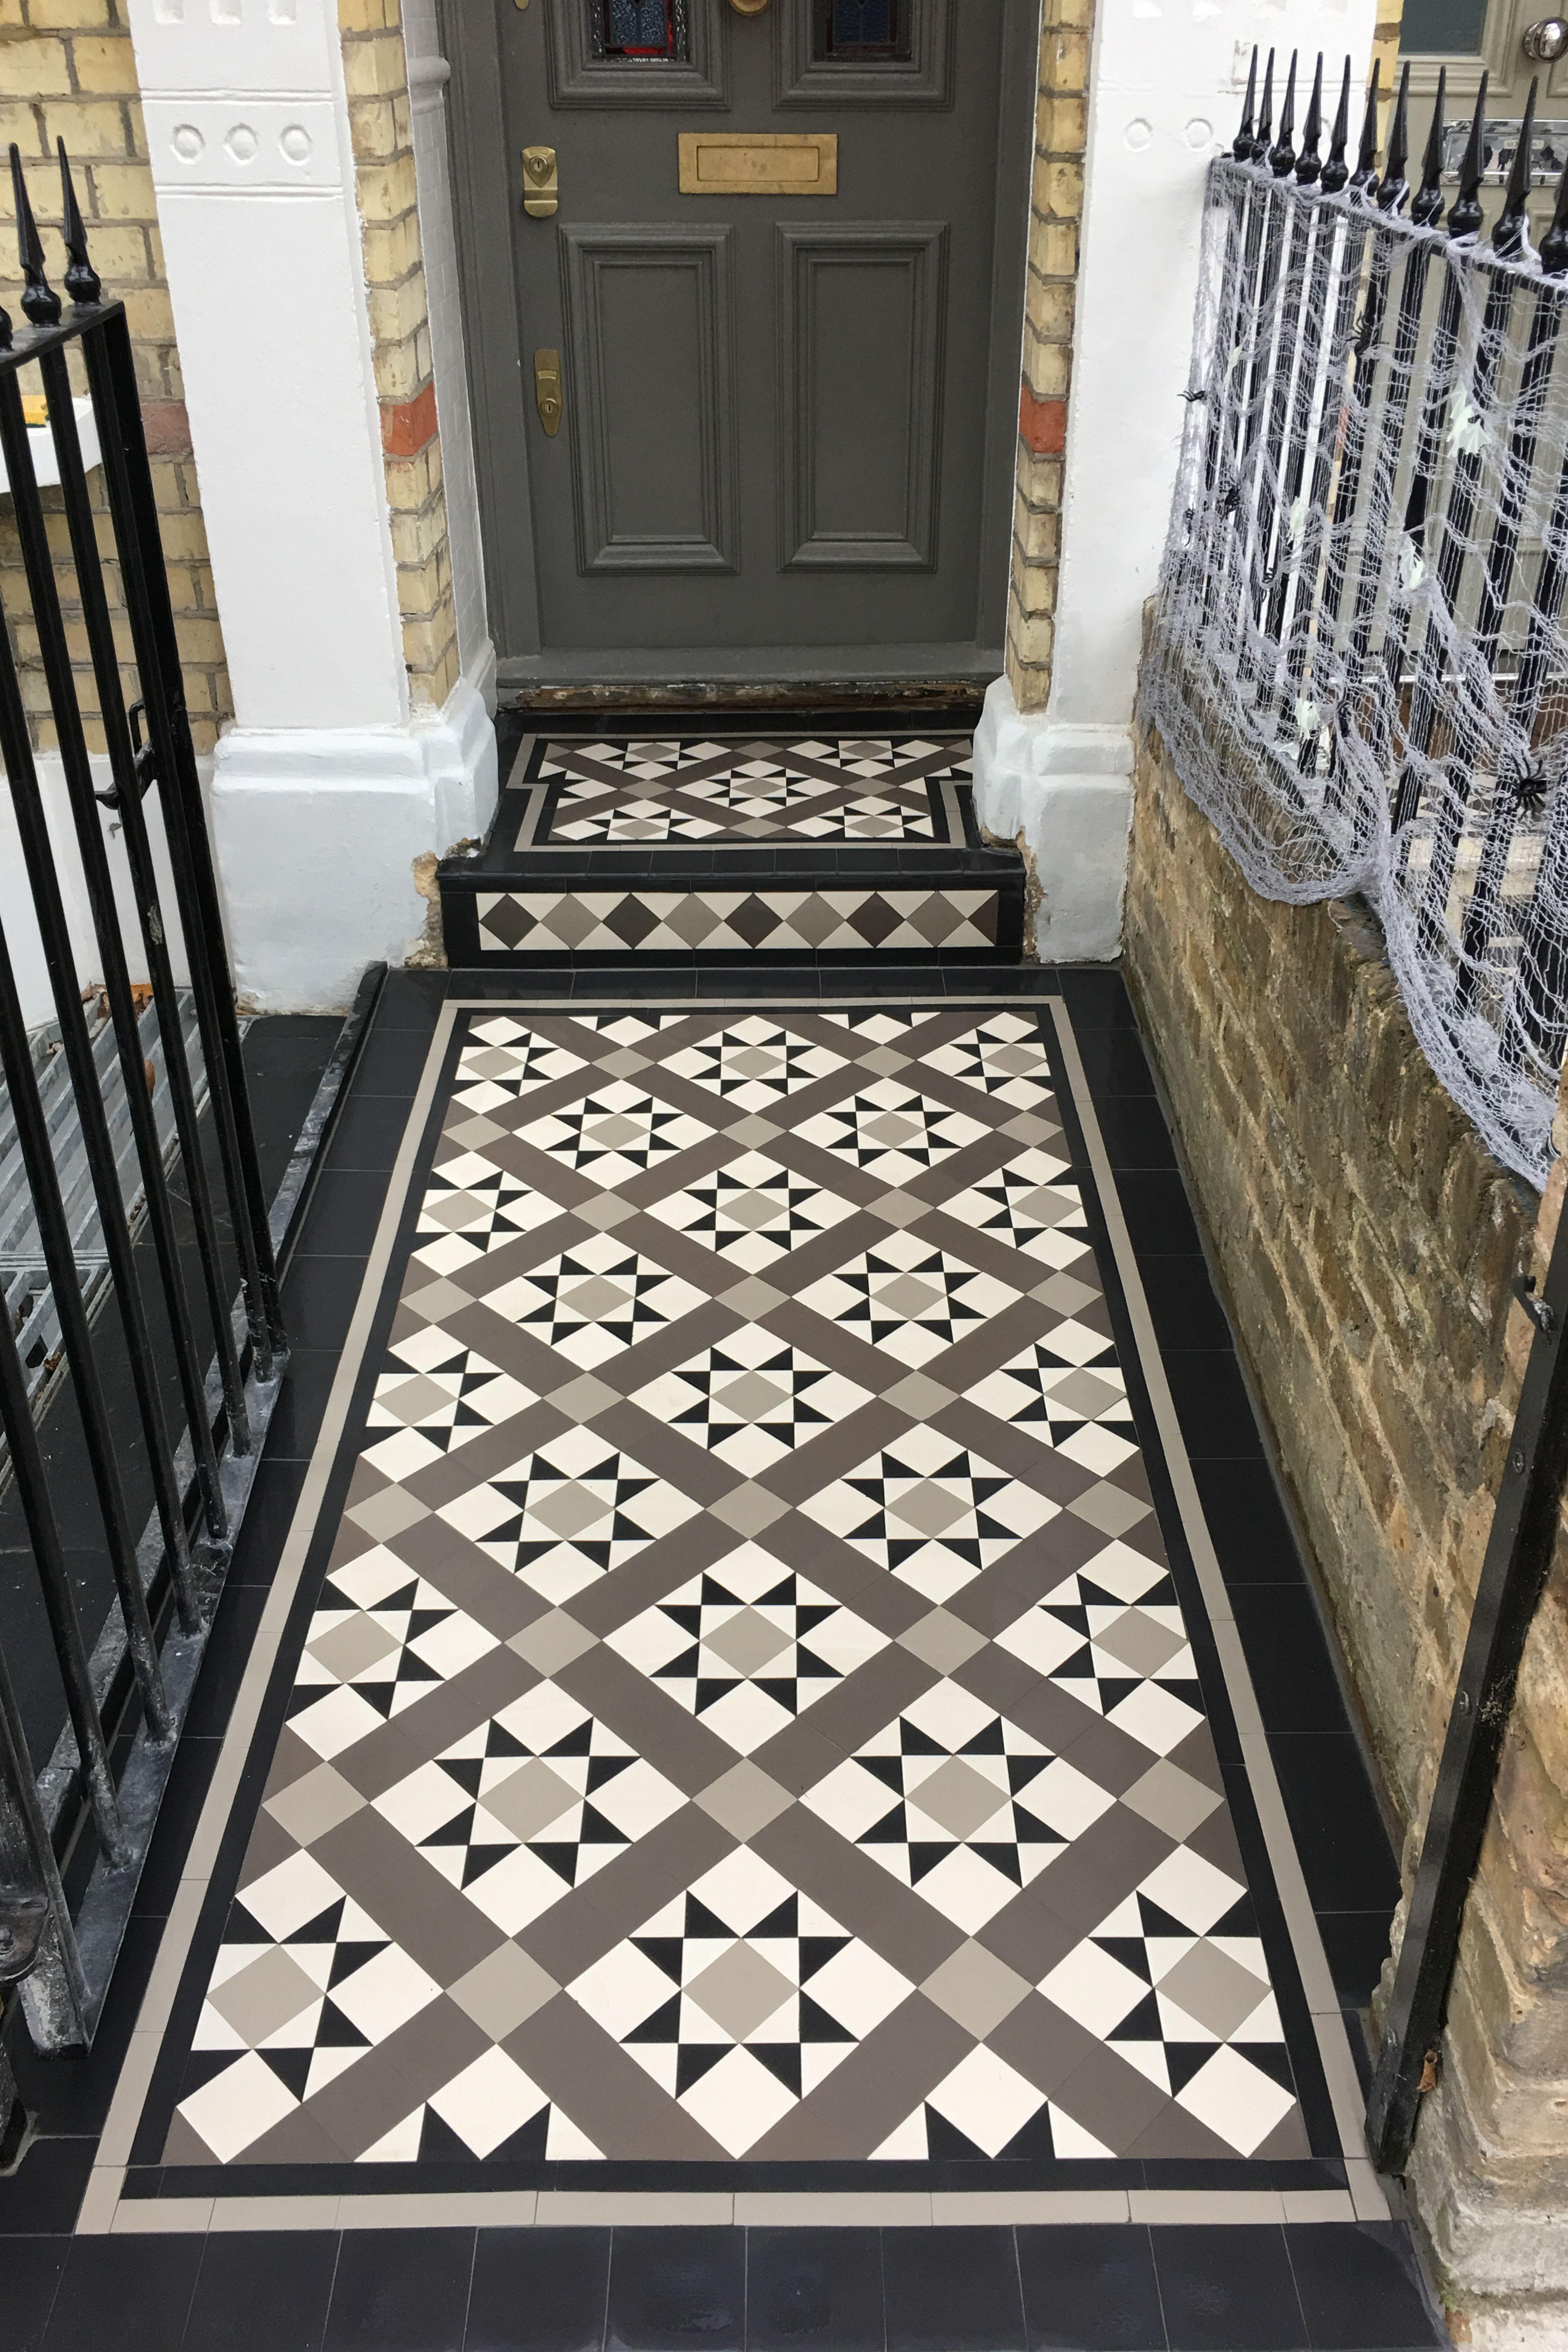 London Mosaic Grey Mosaic Floor Tiles Www Londonmosaic Com Grey Victorian Pathway Greyvictorianflo Modern Floor Tiles Porch Tile Tiled Hallway